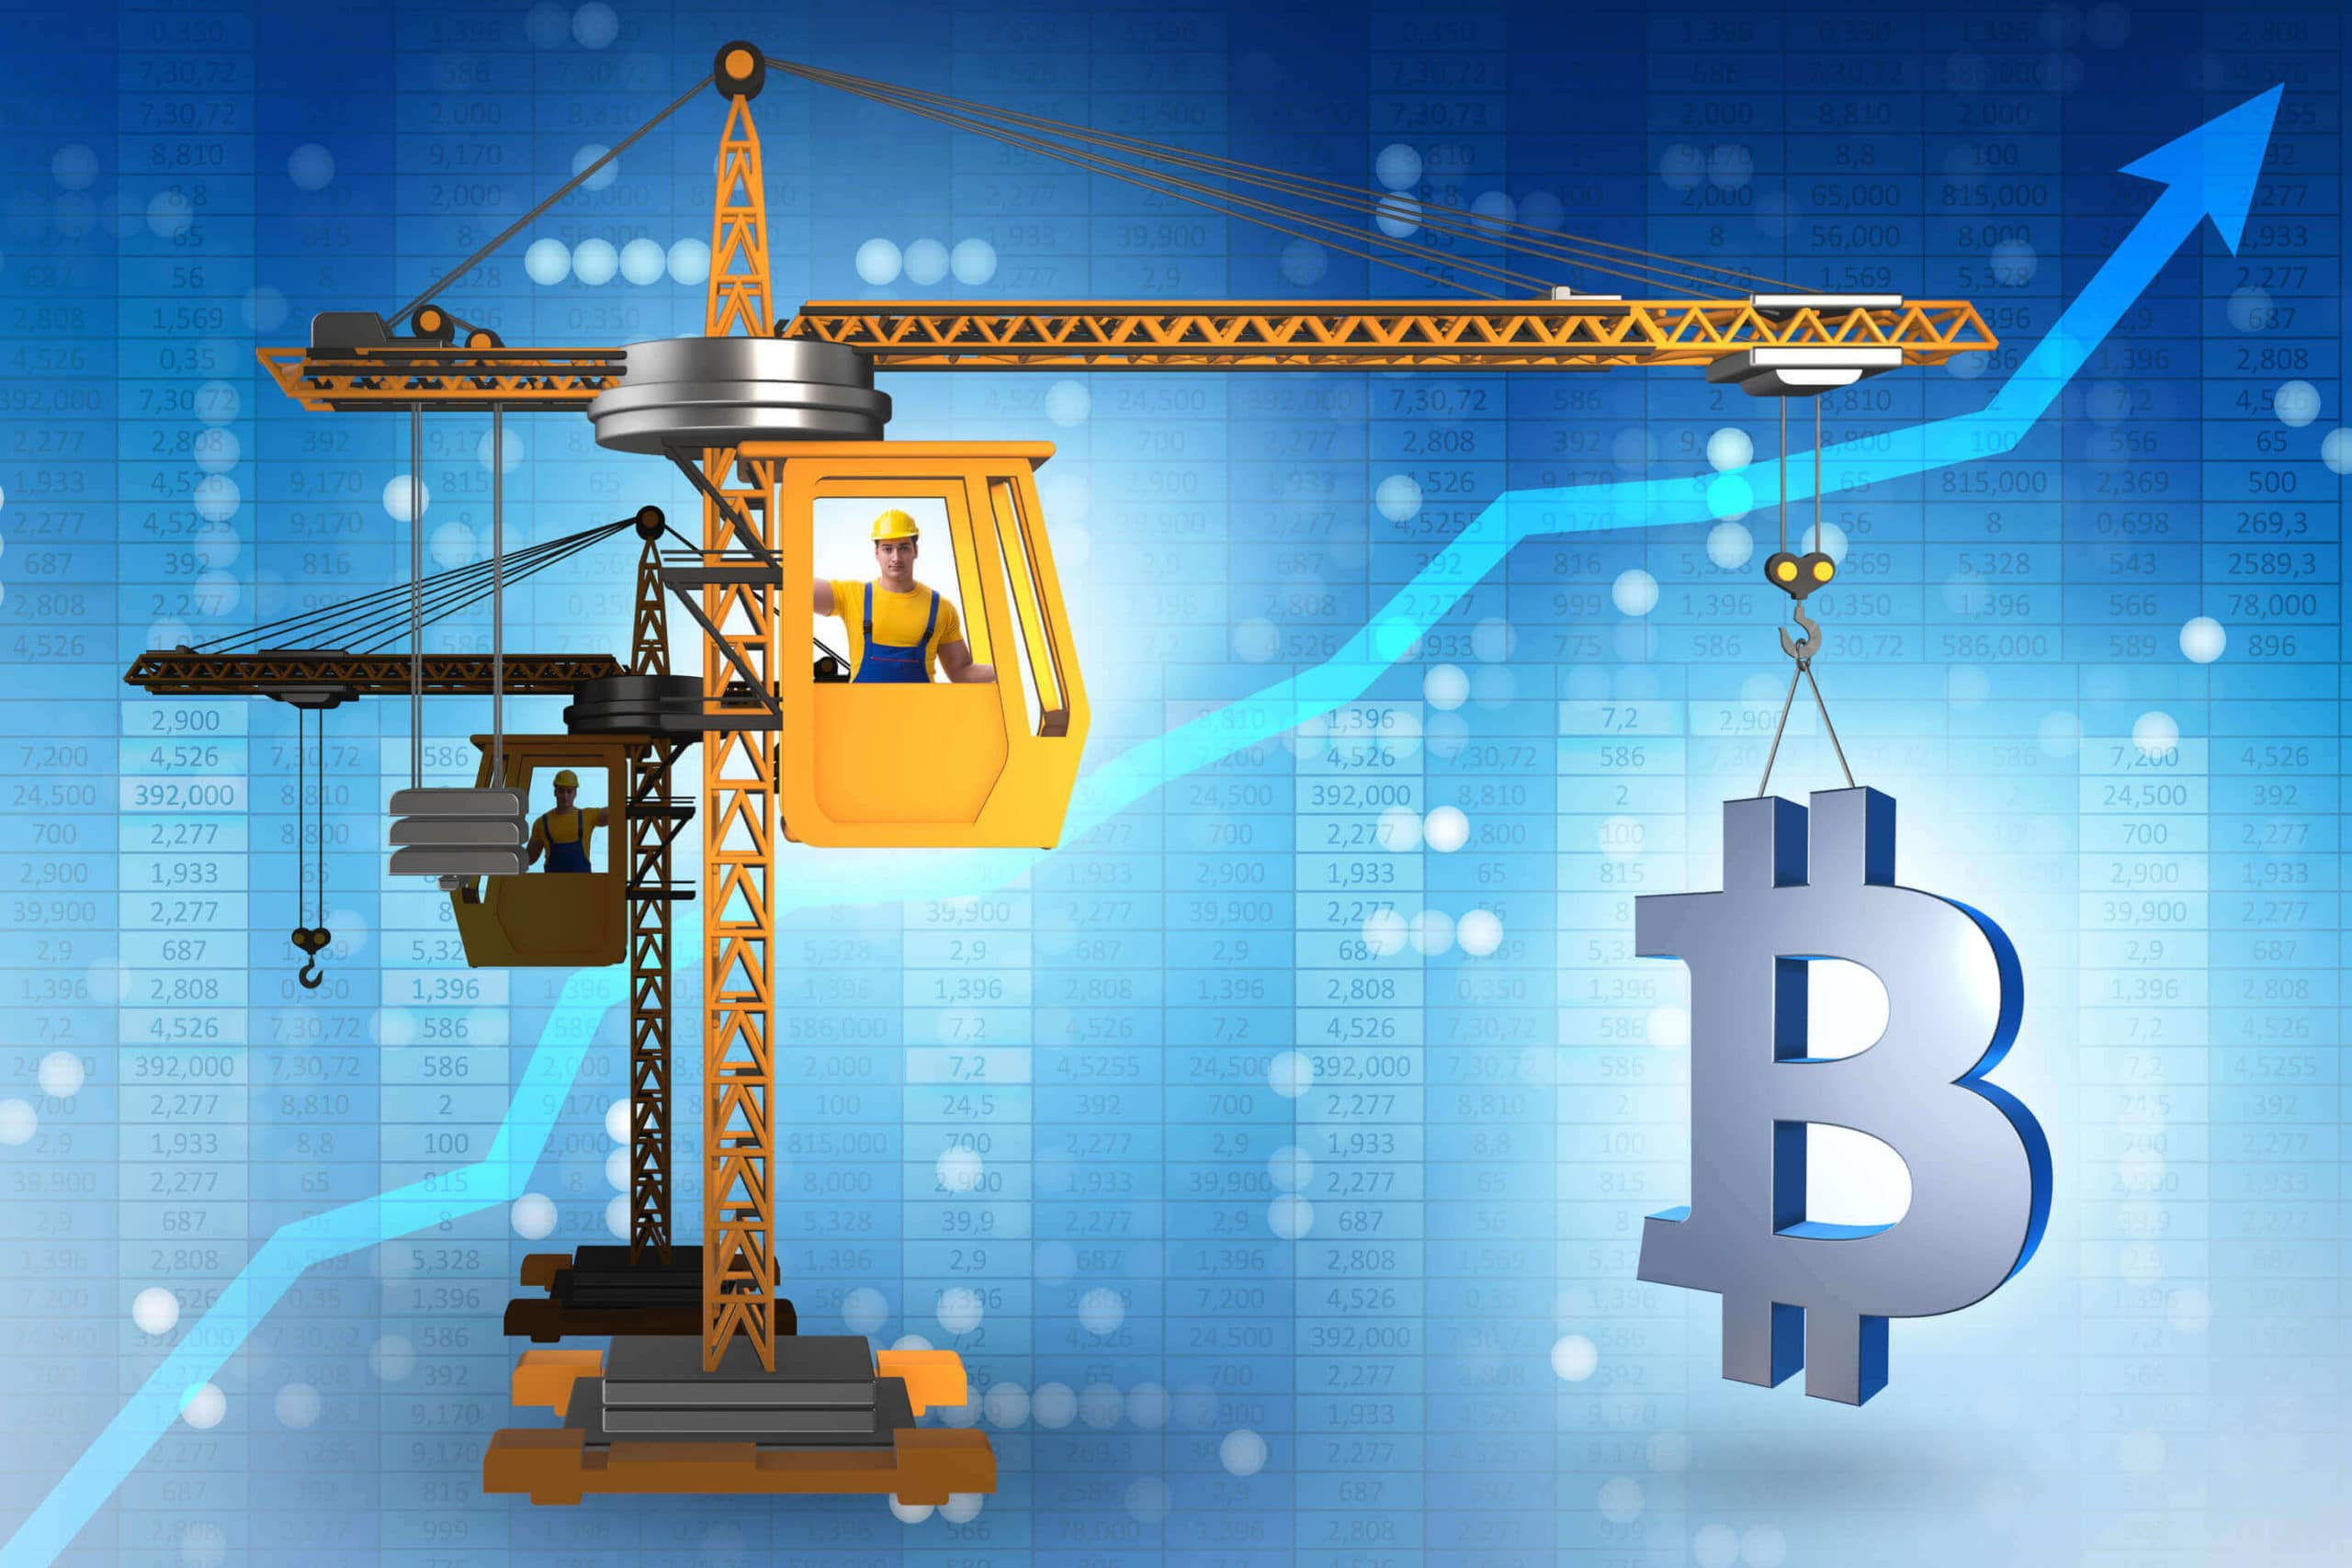 Bitcoin Prognose 2025 am Kran